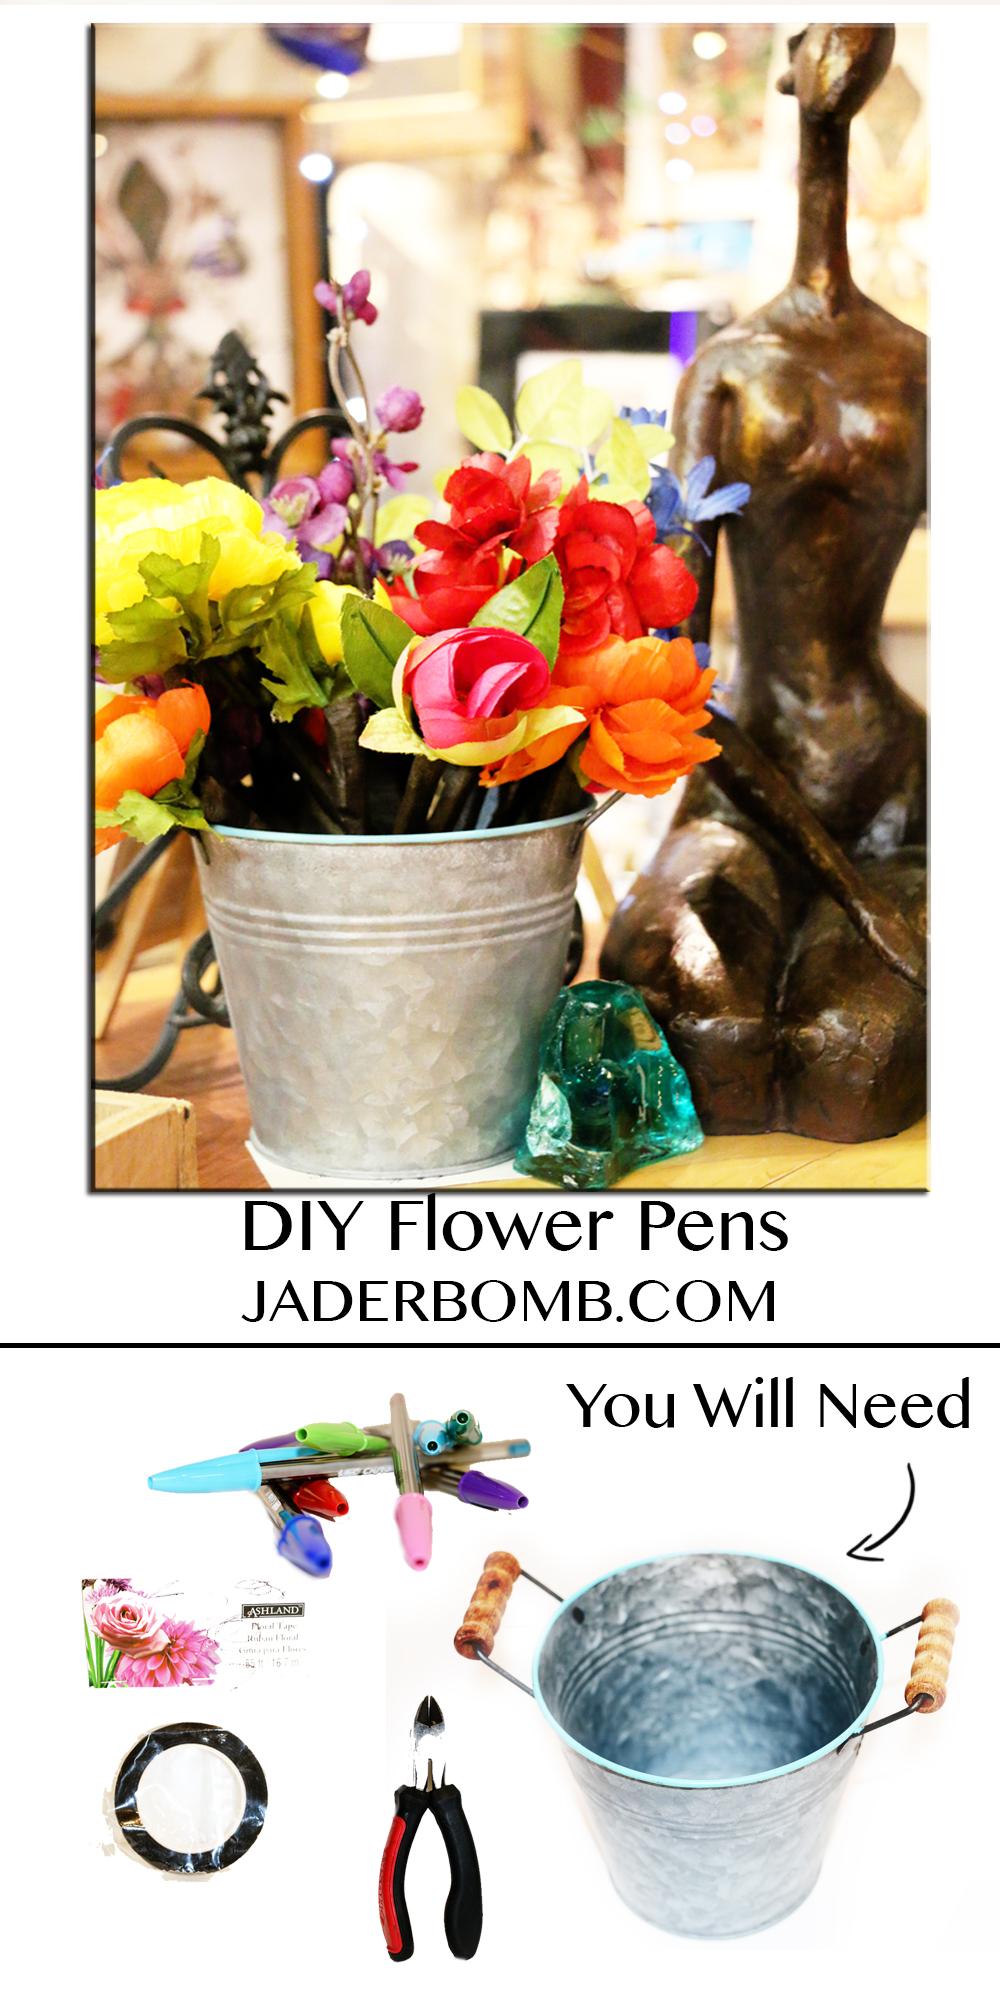 DIY FLOWER PEN TUTORIAL MICHAELS MAKERS